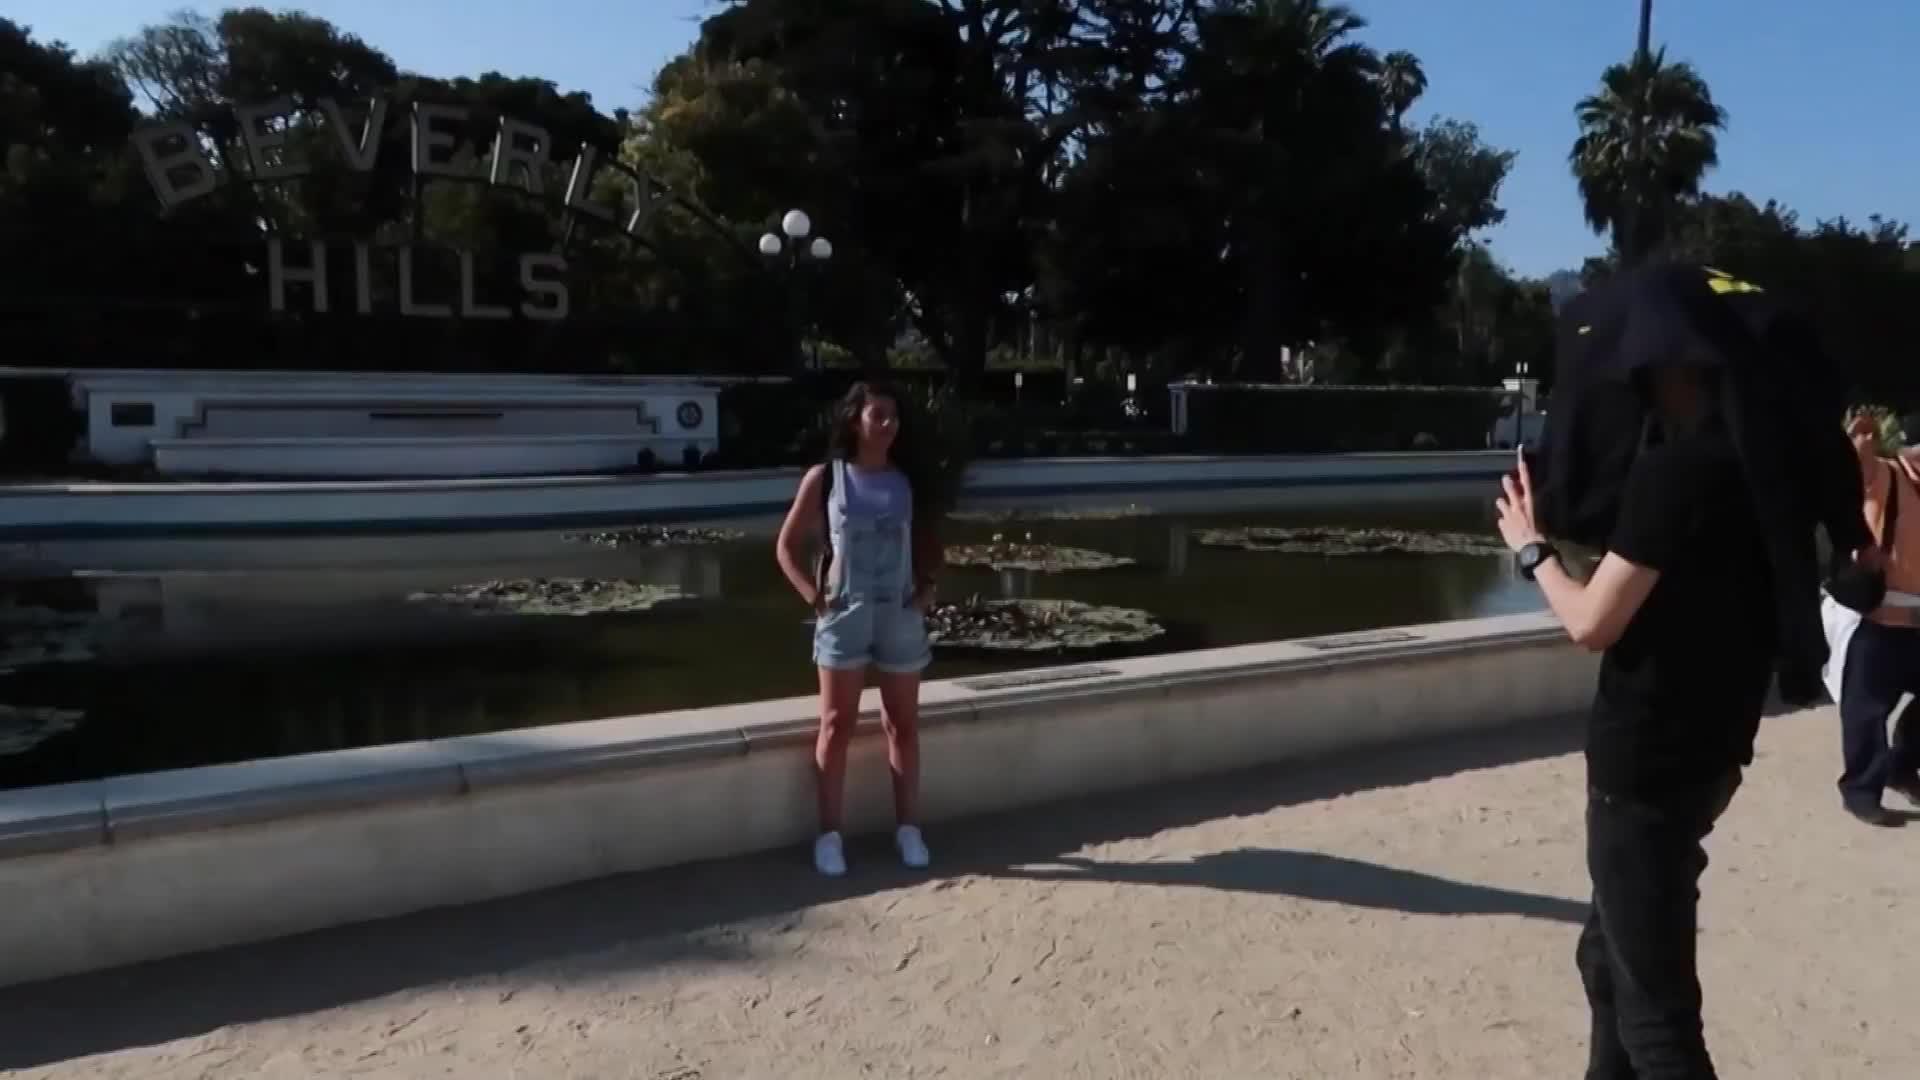 soccergifs, Lisa Zimouche - Los Angeles GIFs